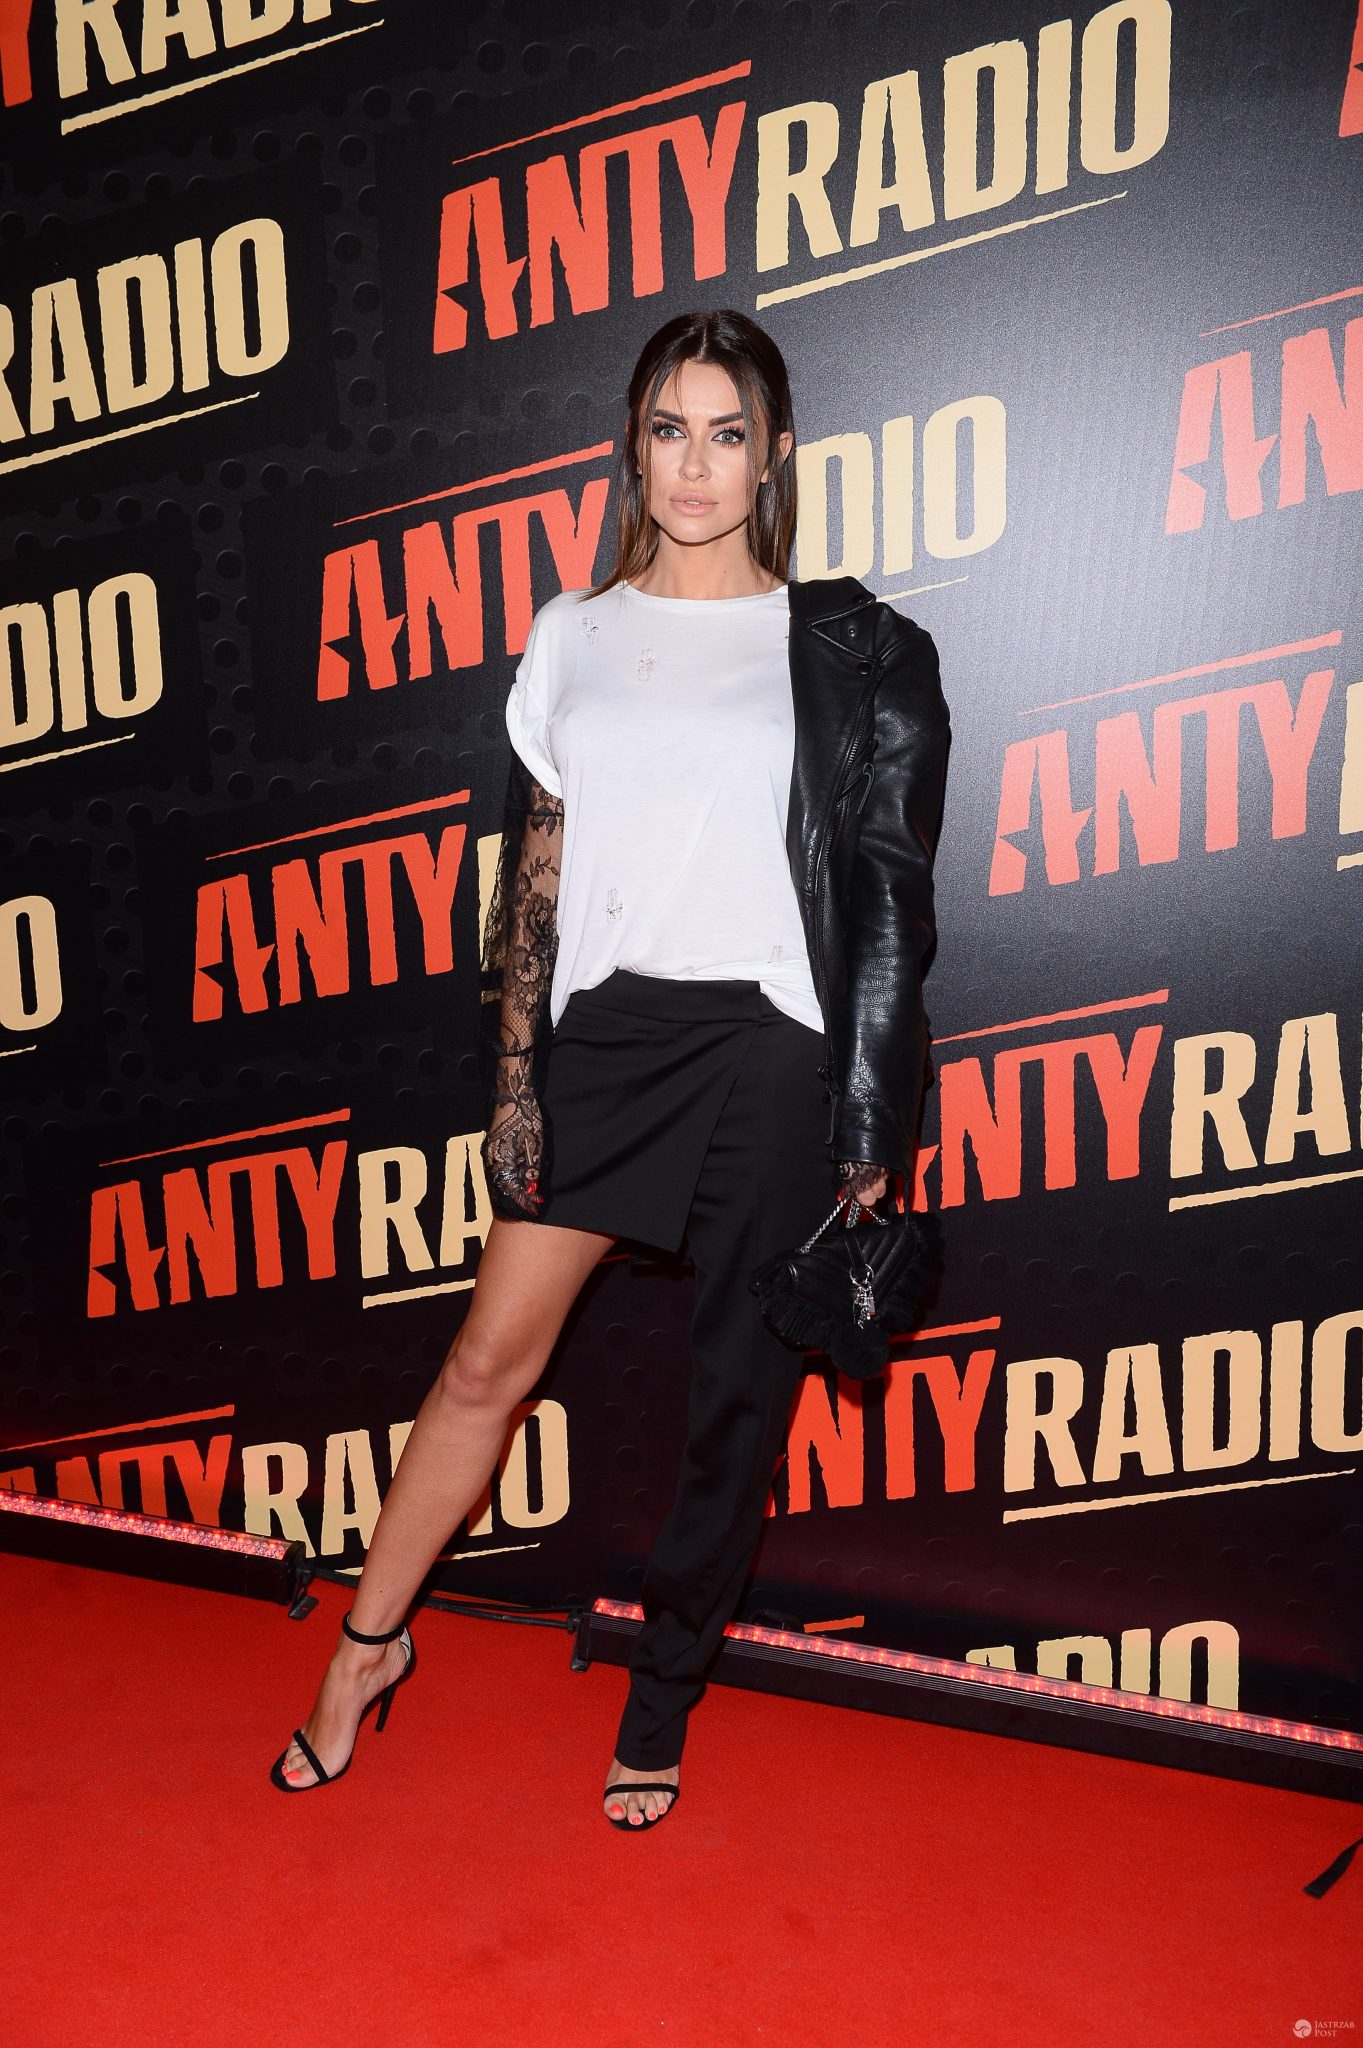 Natalia Siwiec - AntyRadio 2017